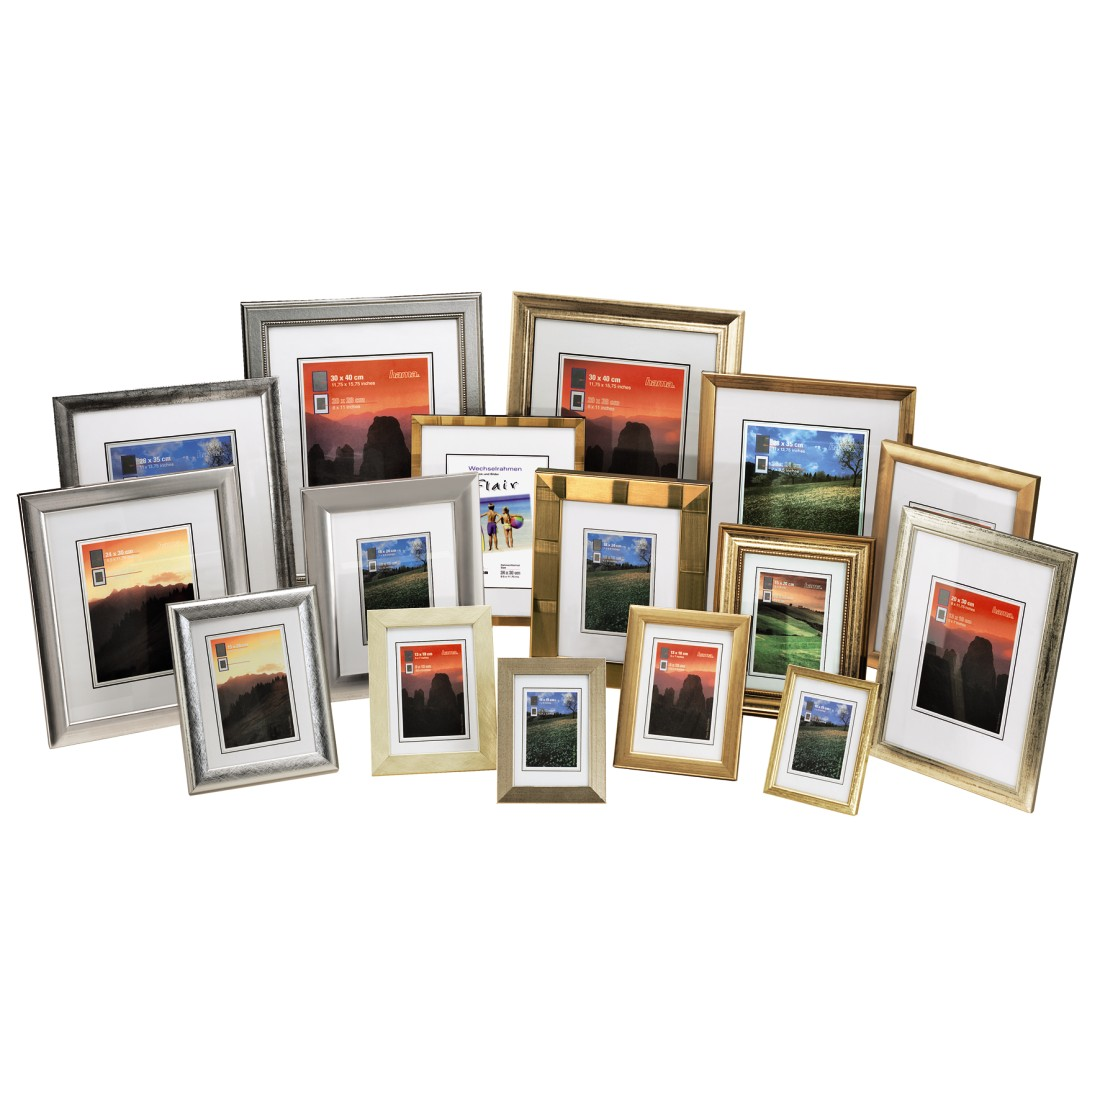 00031129 Hama Turin Wooden Frame Goldensilver 20 X 30 Cm Ip